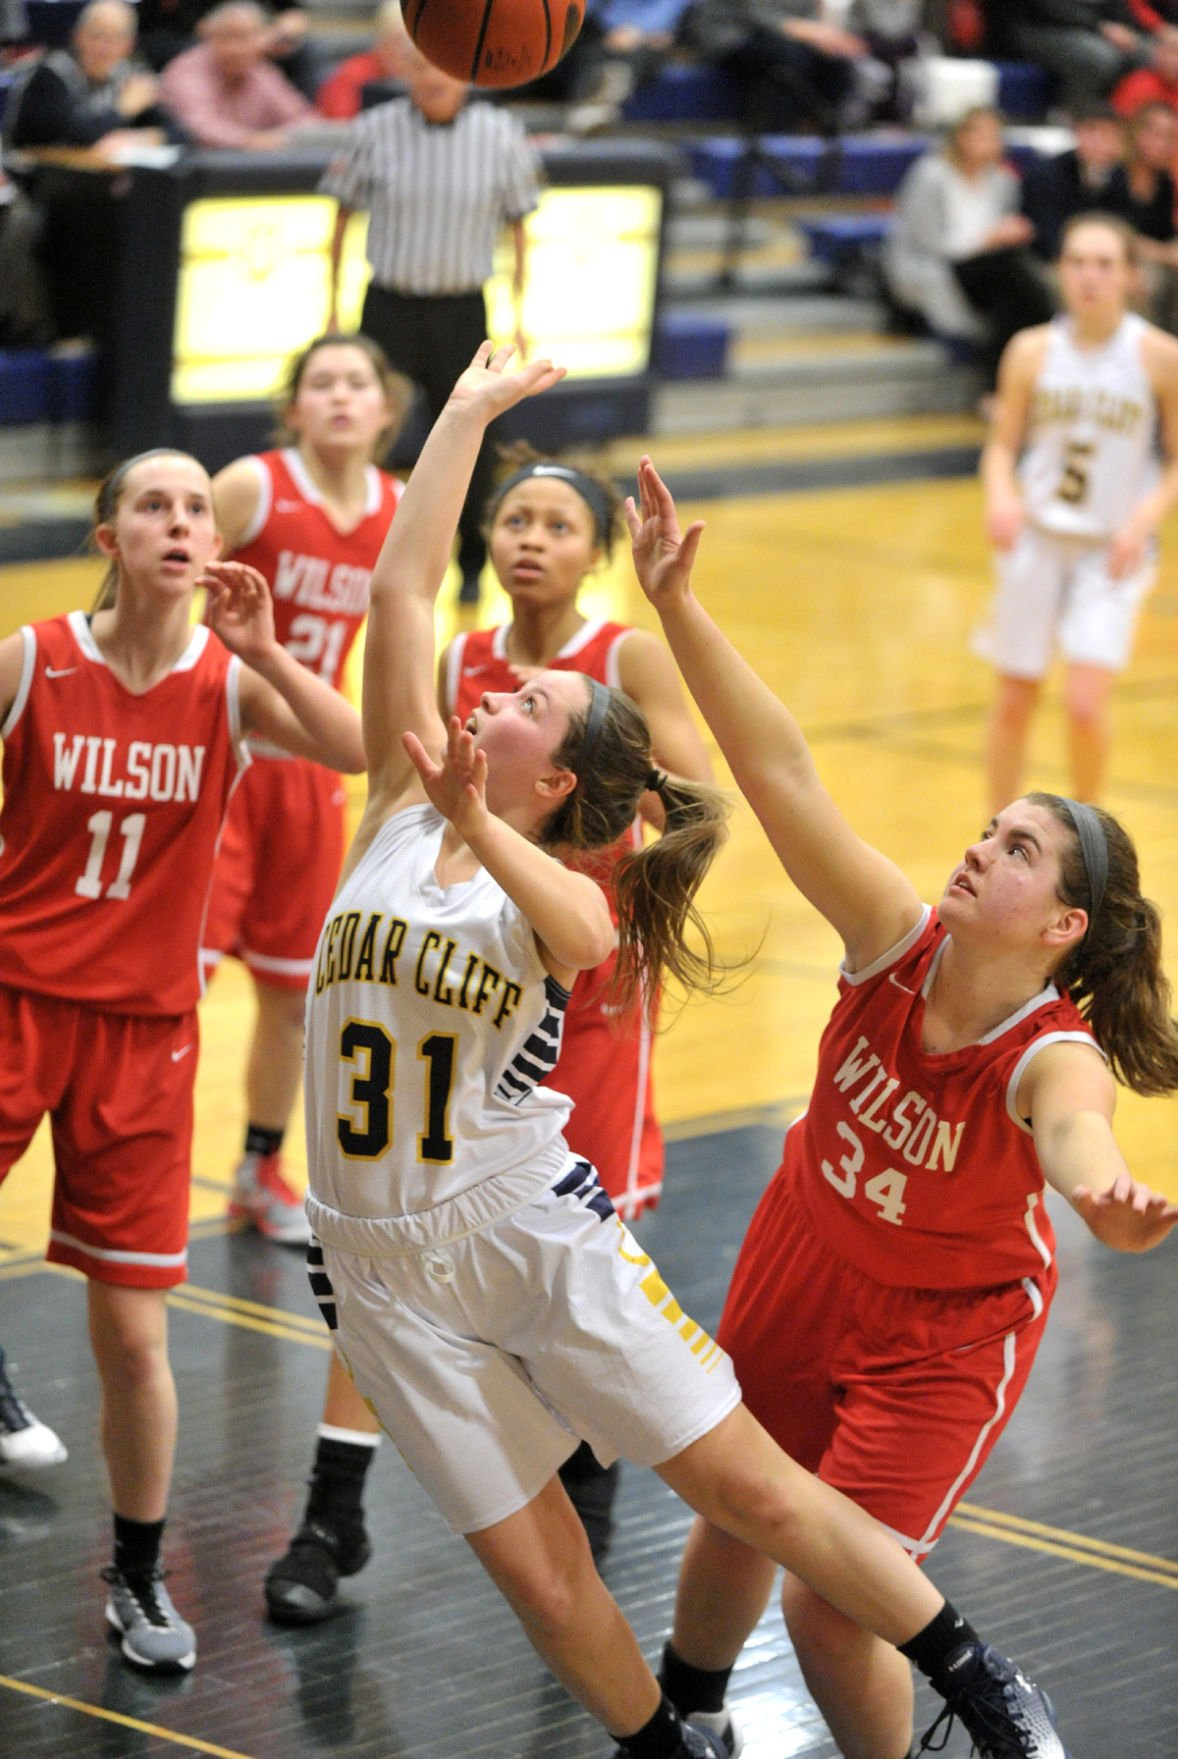 Girls Basketball Wilson at Cedar Cliff, Feb 20, 2017 (copy)